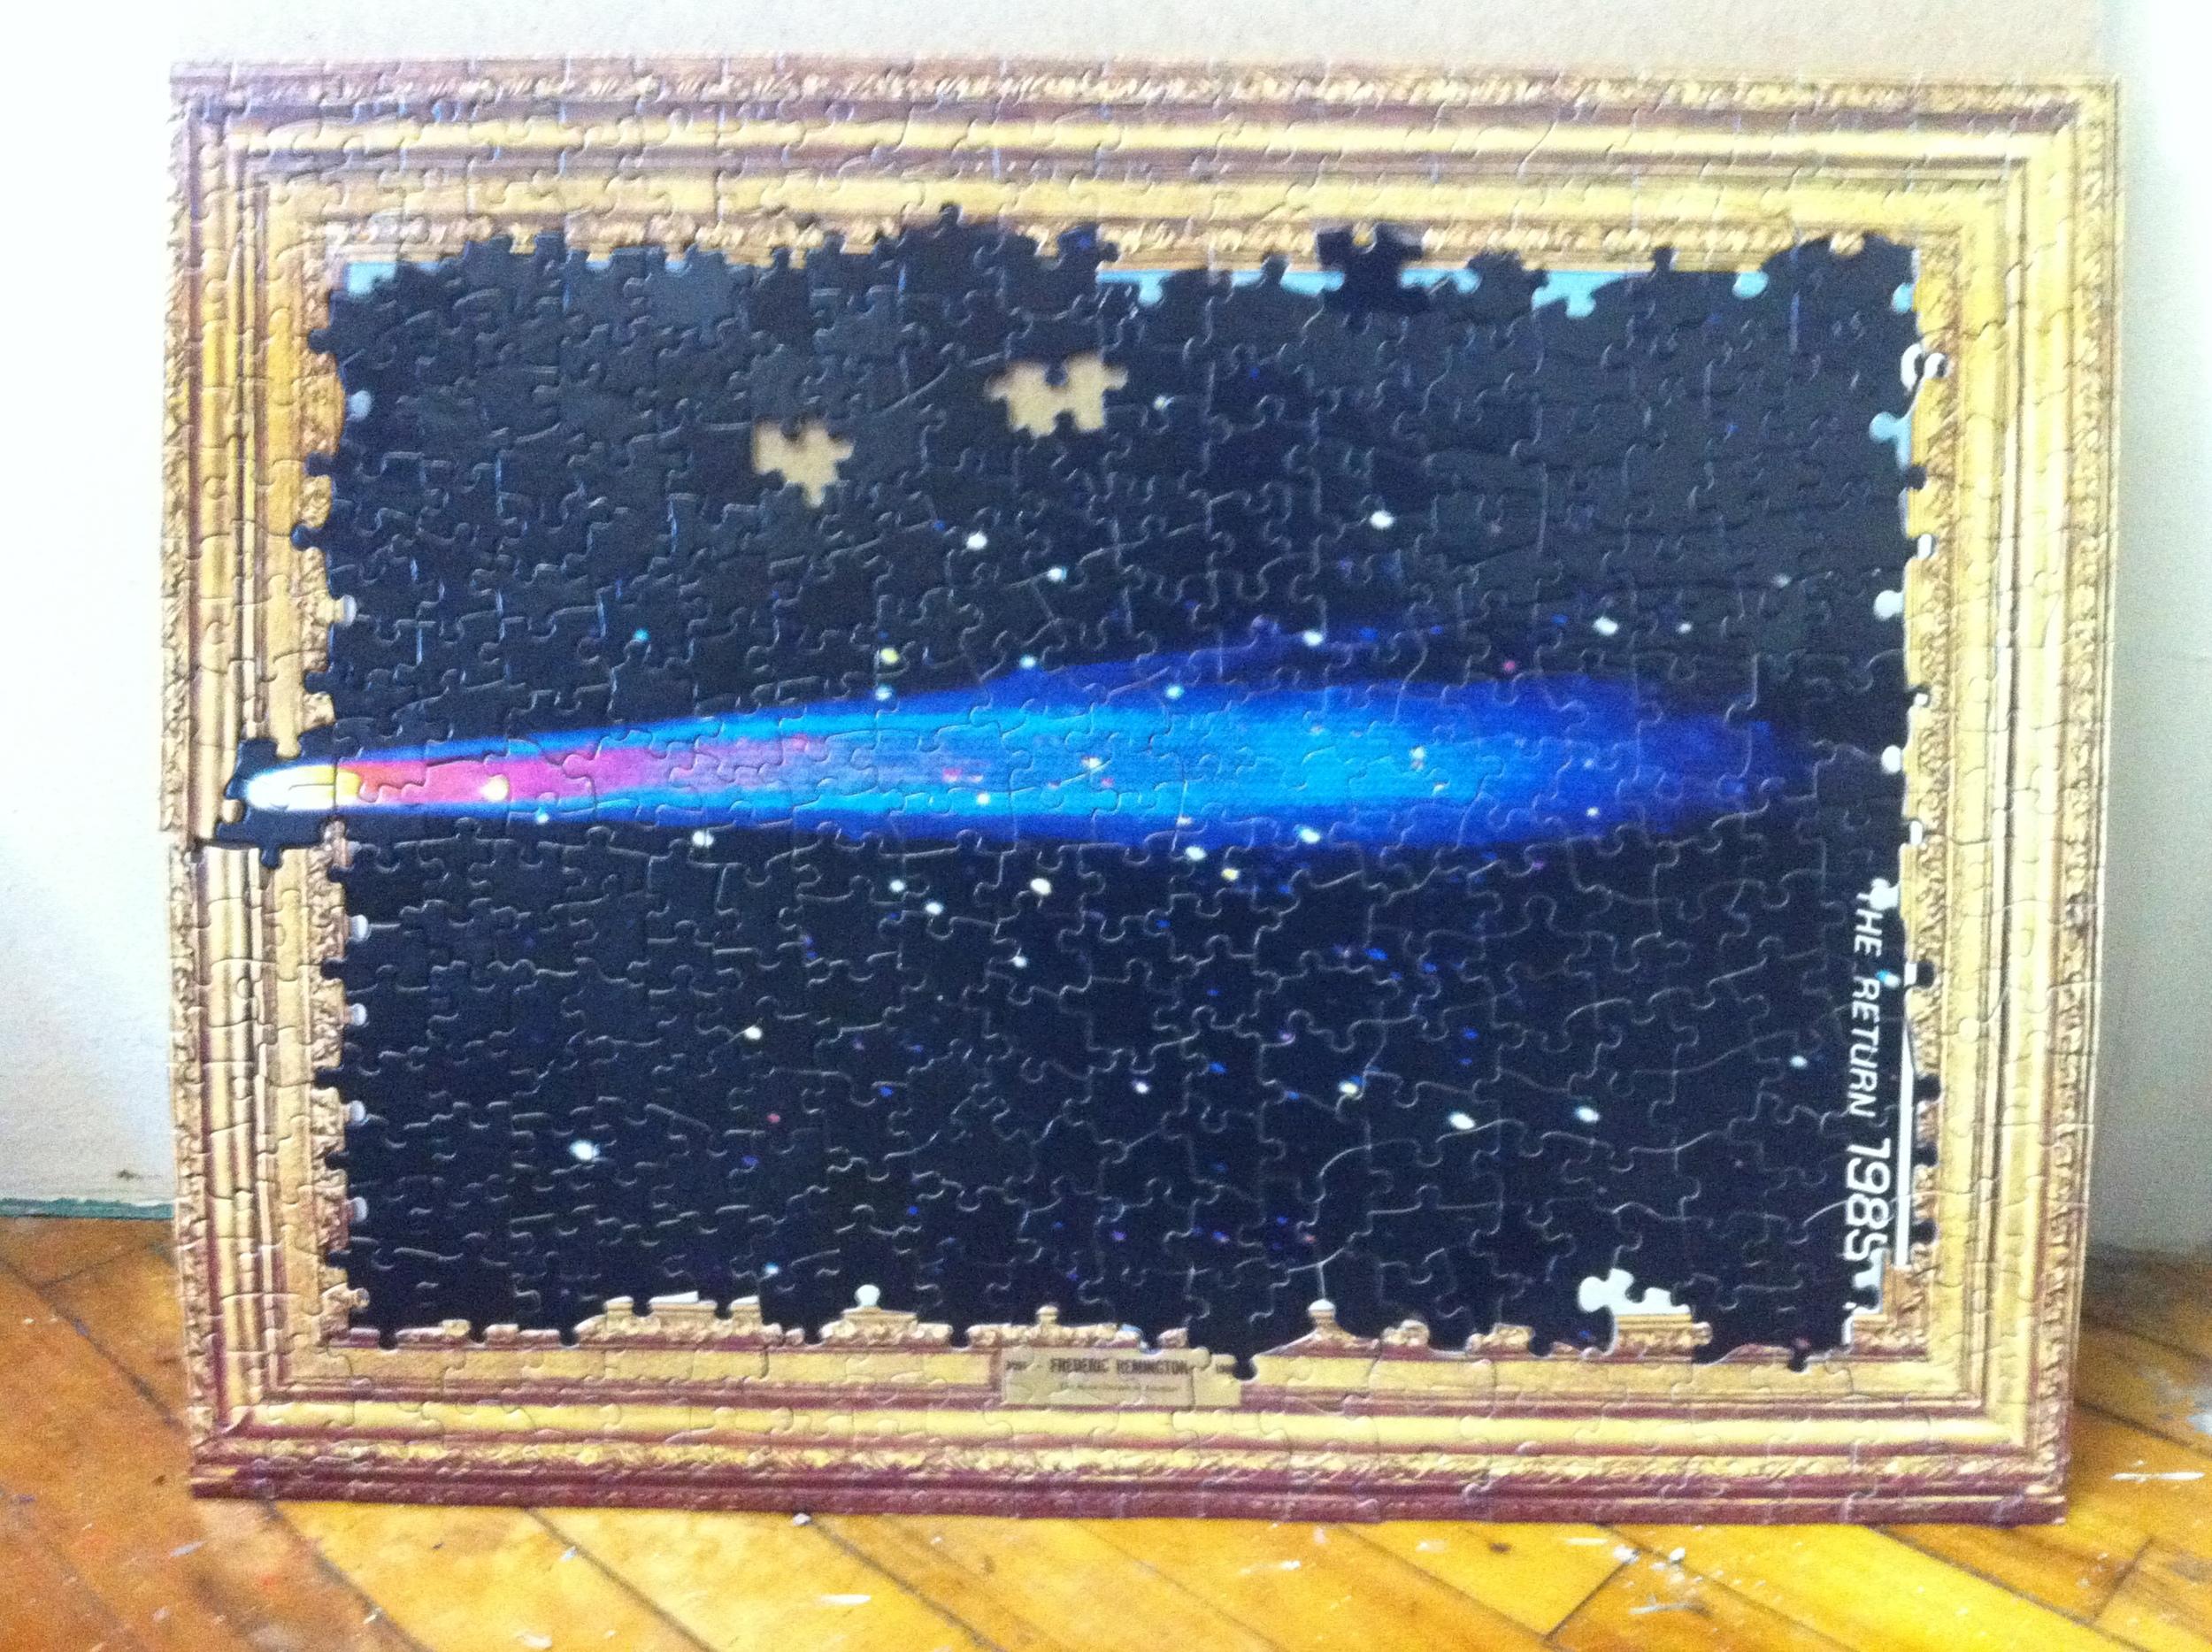 Haley's comet, Puzzle Collage